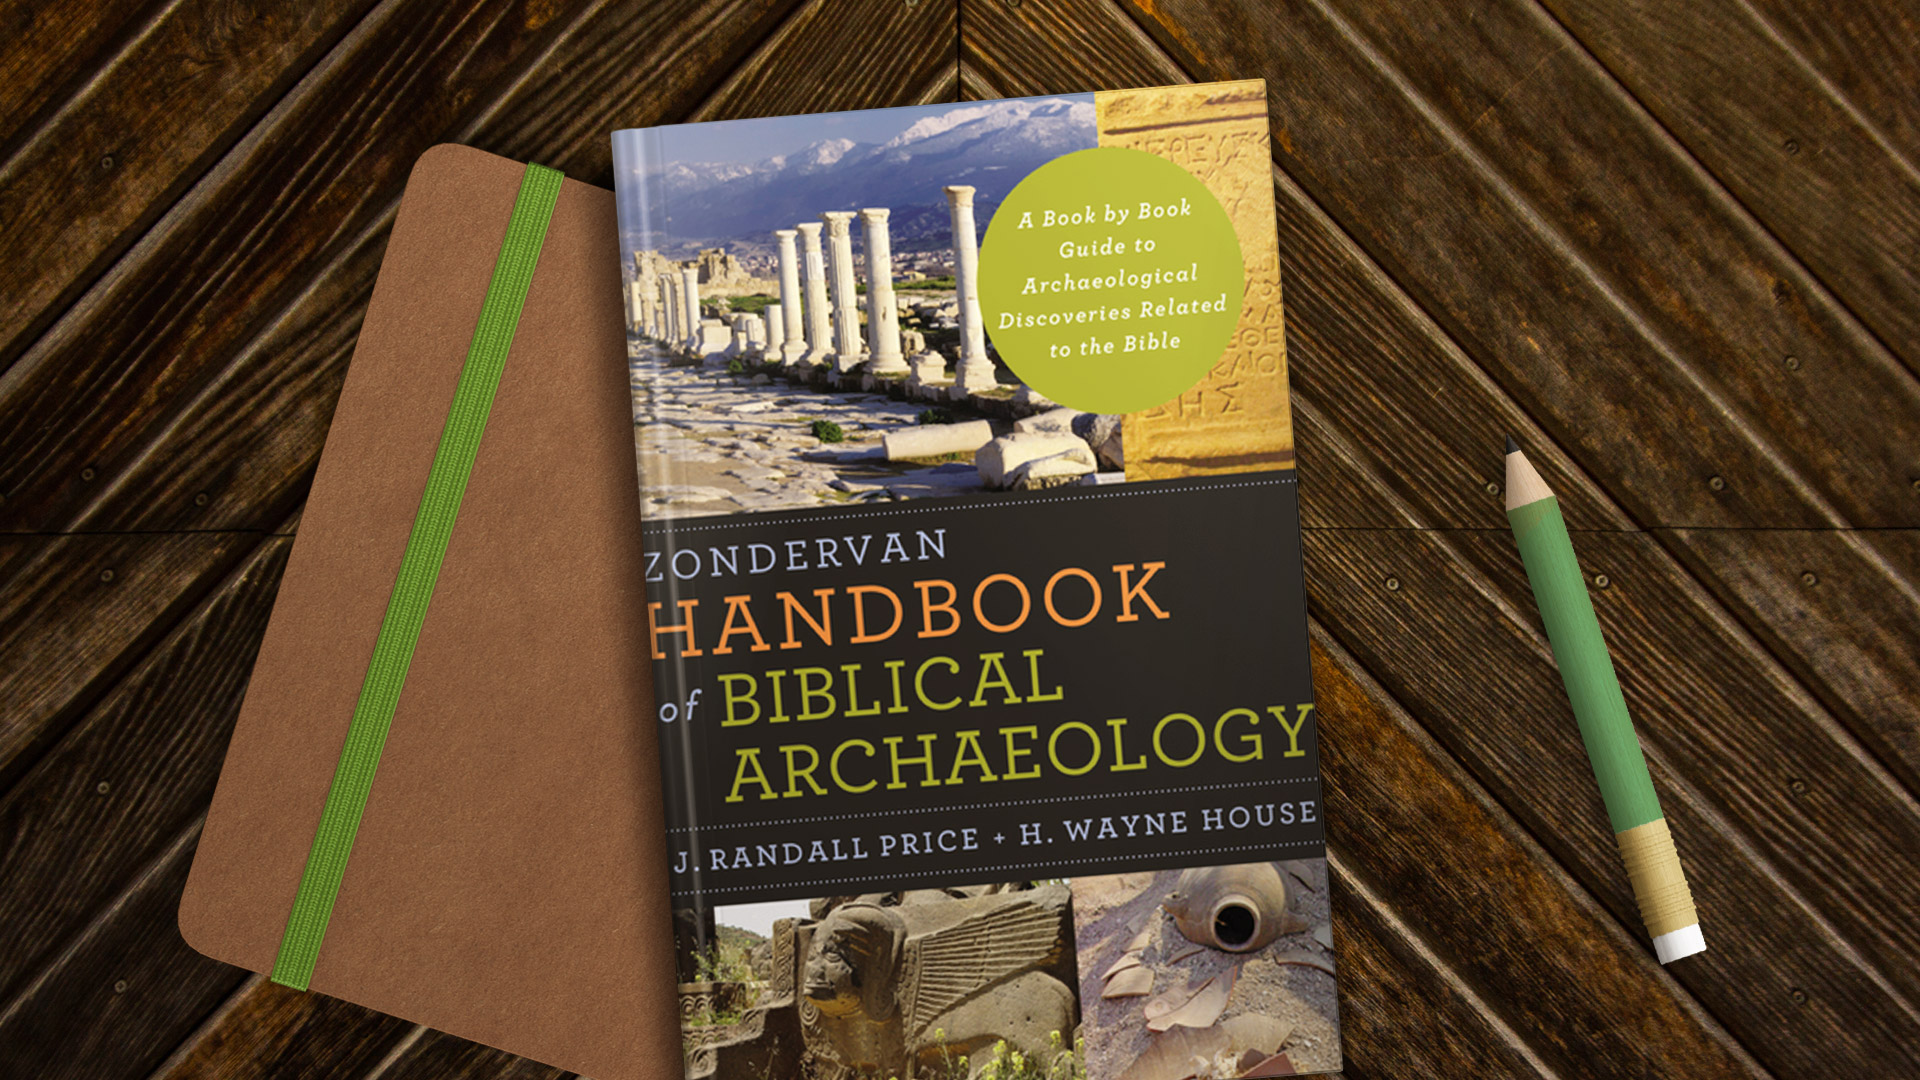 Book cover Zondervan Handbook of Biblical Archaeology on desk